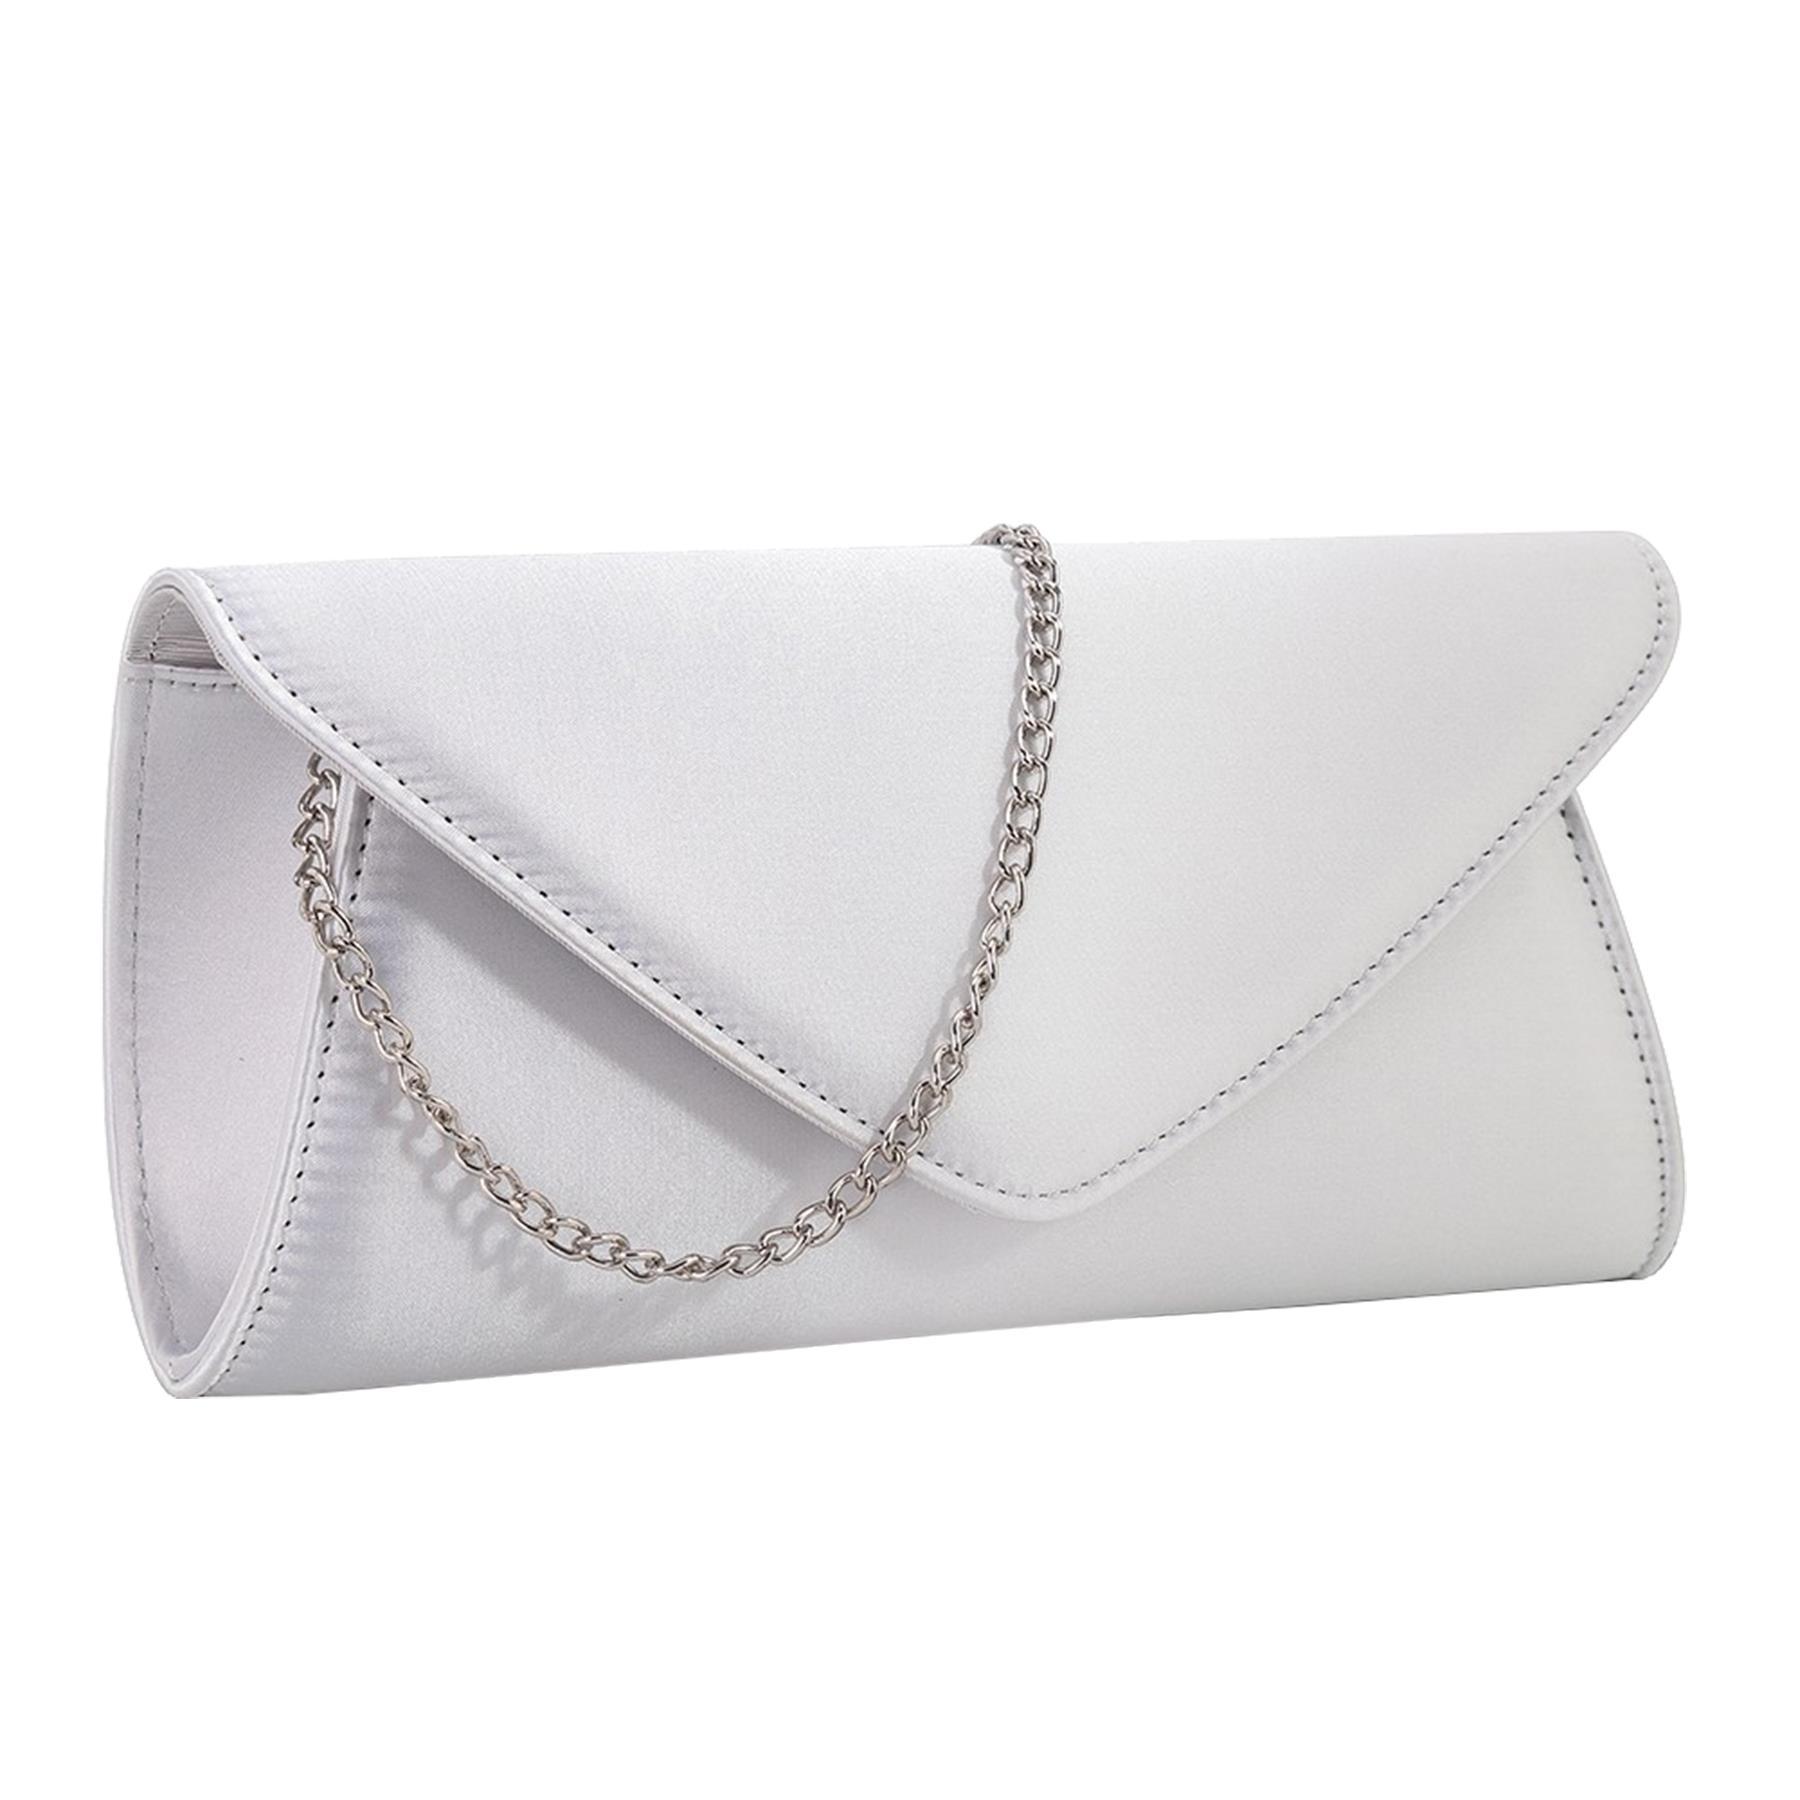 New-Ladies-Stylish-3D-Envelope-Satin-Prom-Party-Clutch-Bag-Purse thumbnail 12